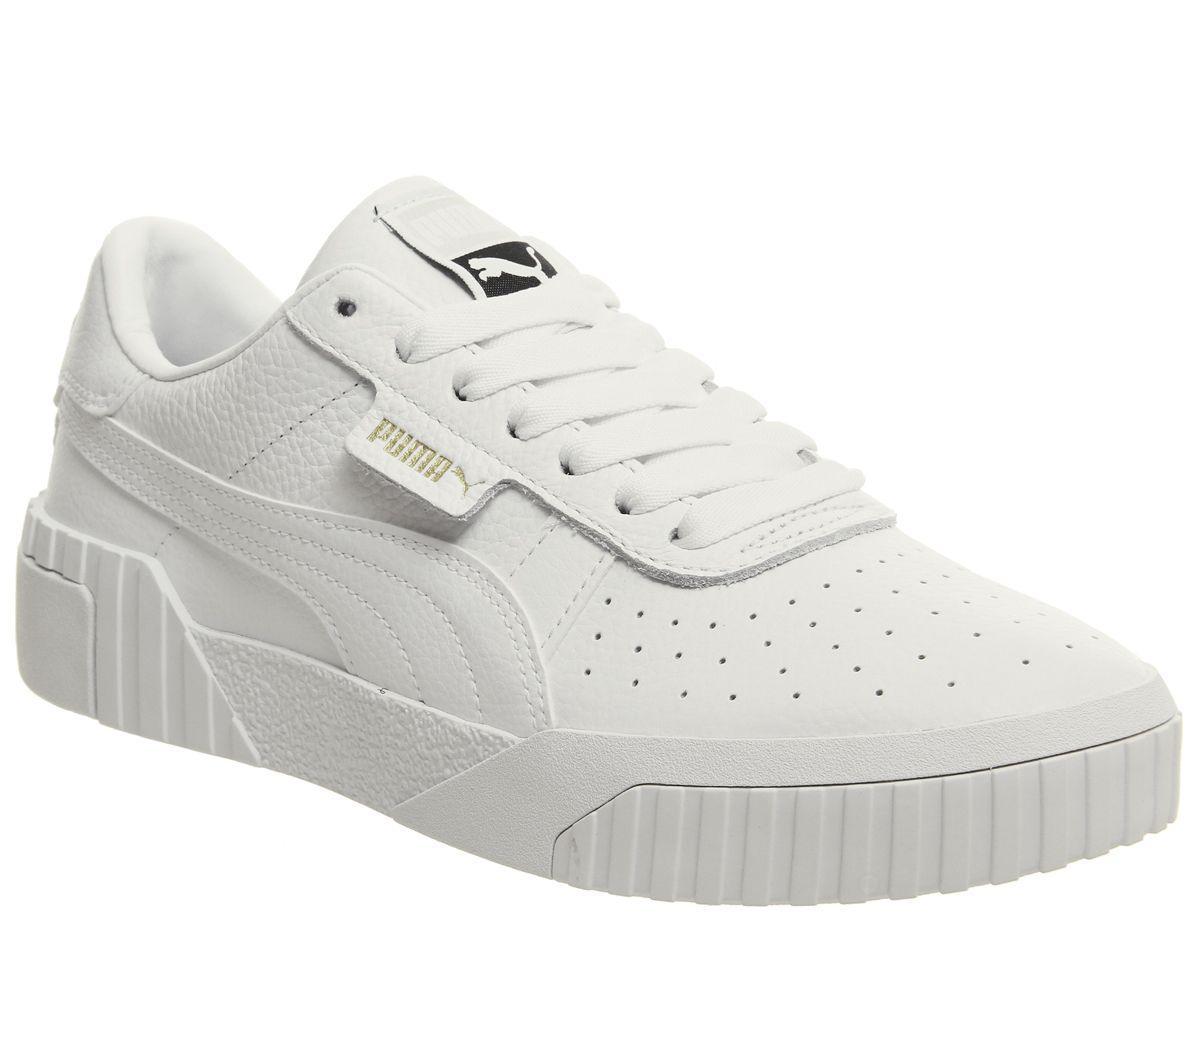 PUMA Leather Cali Trainers in White